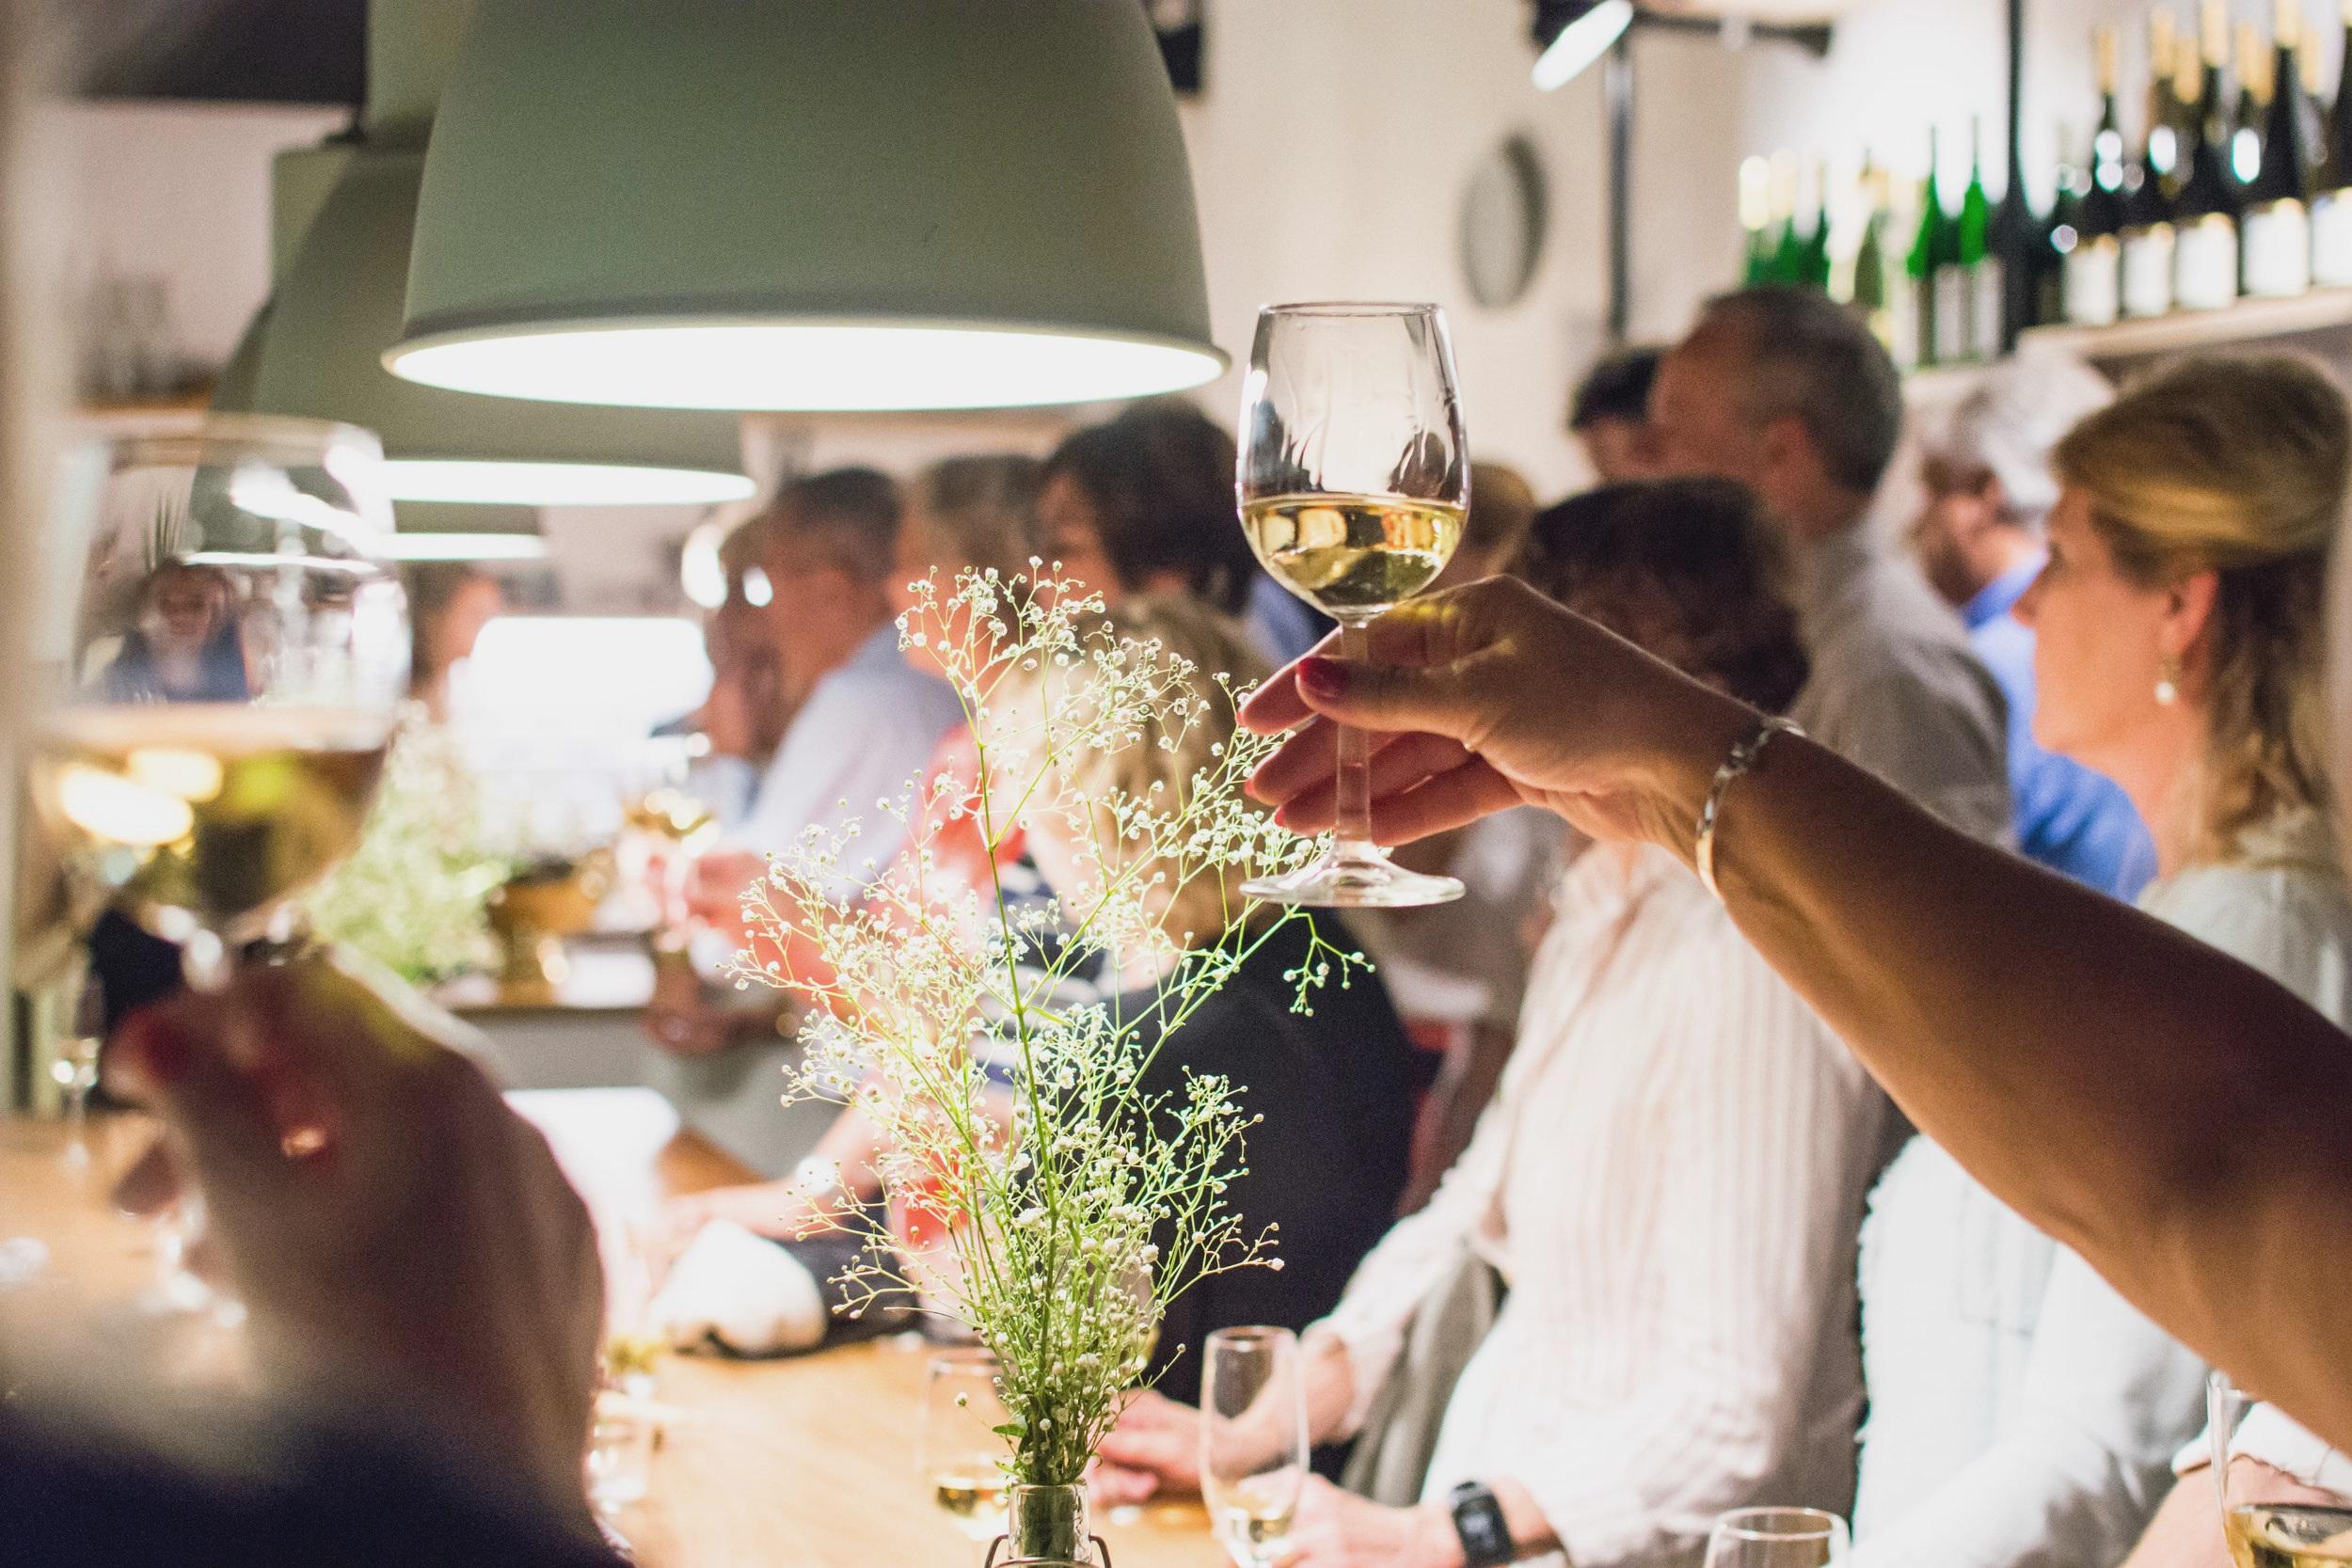 WINE TASTINGS -